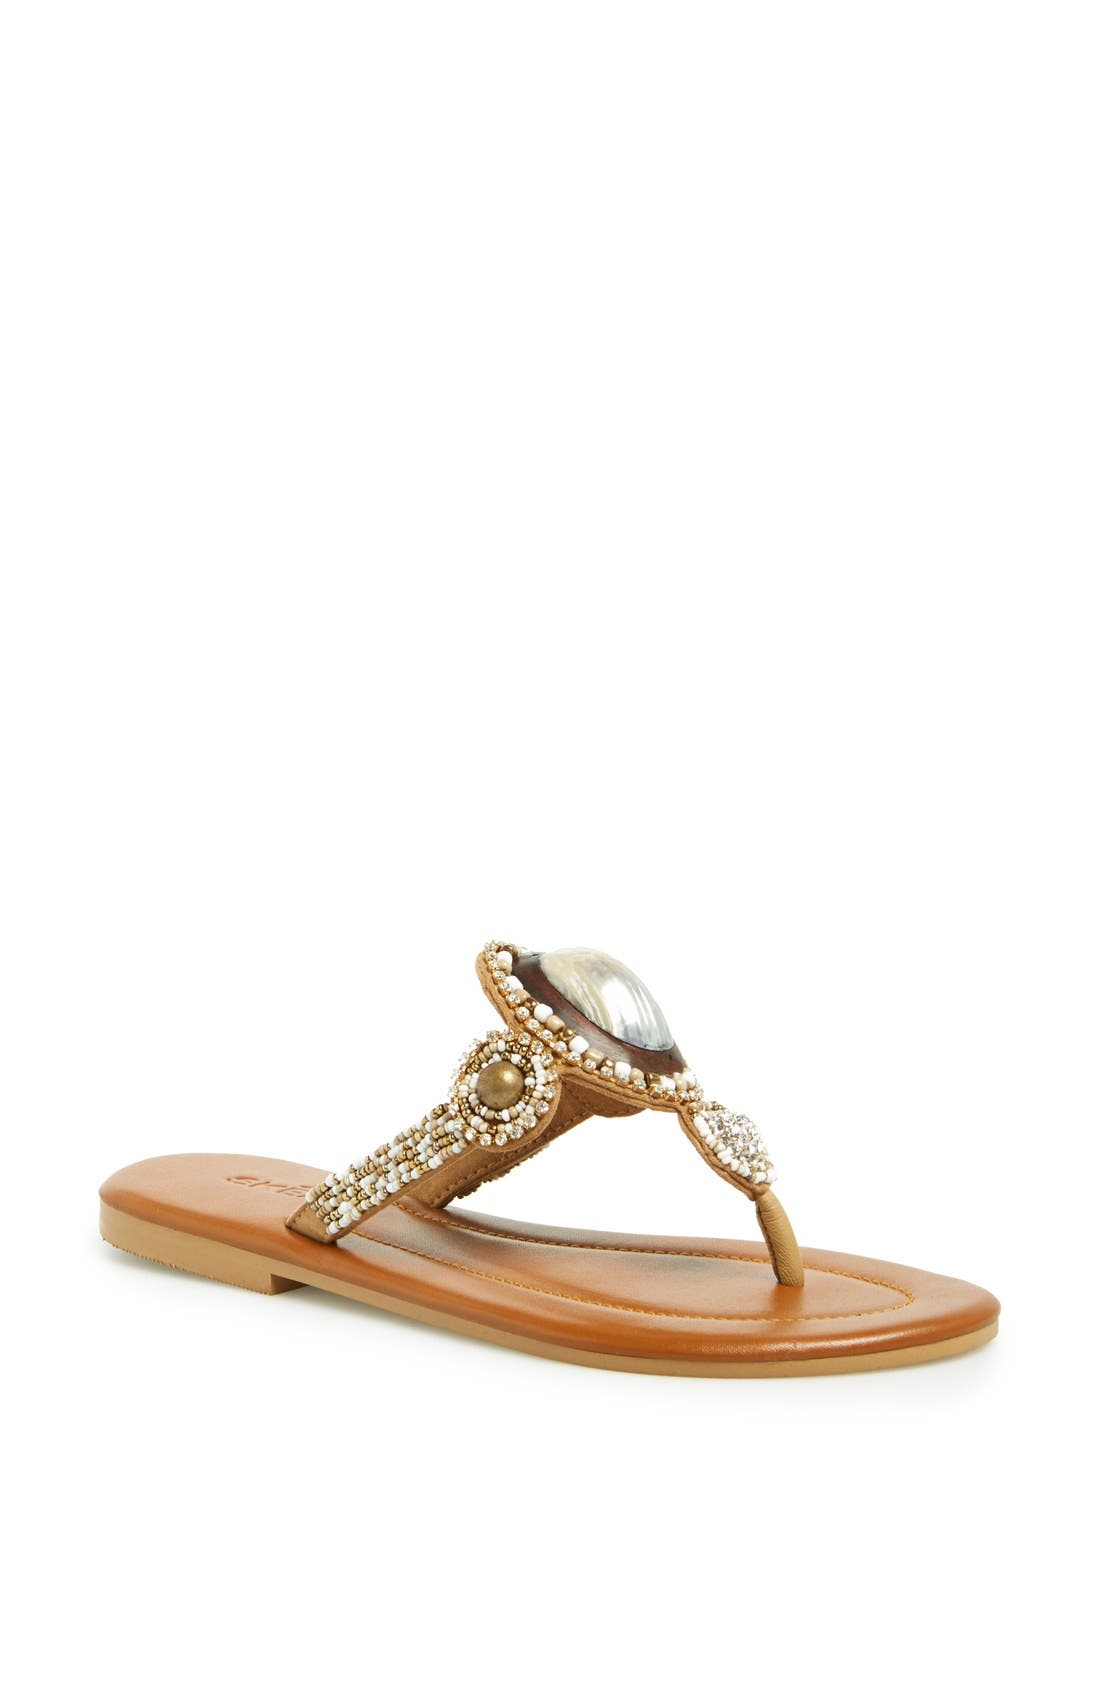 Main Image - Skemo 'Siwa' Sandal